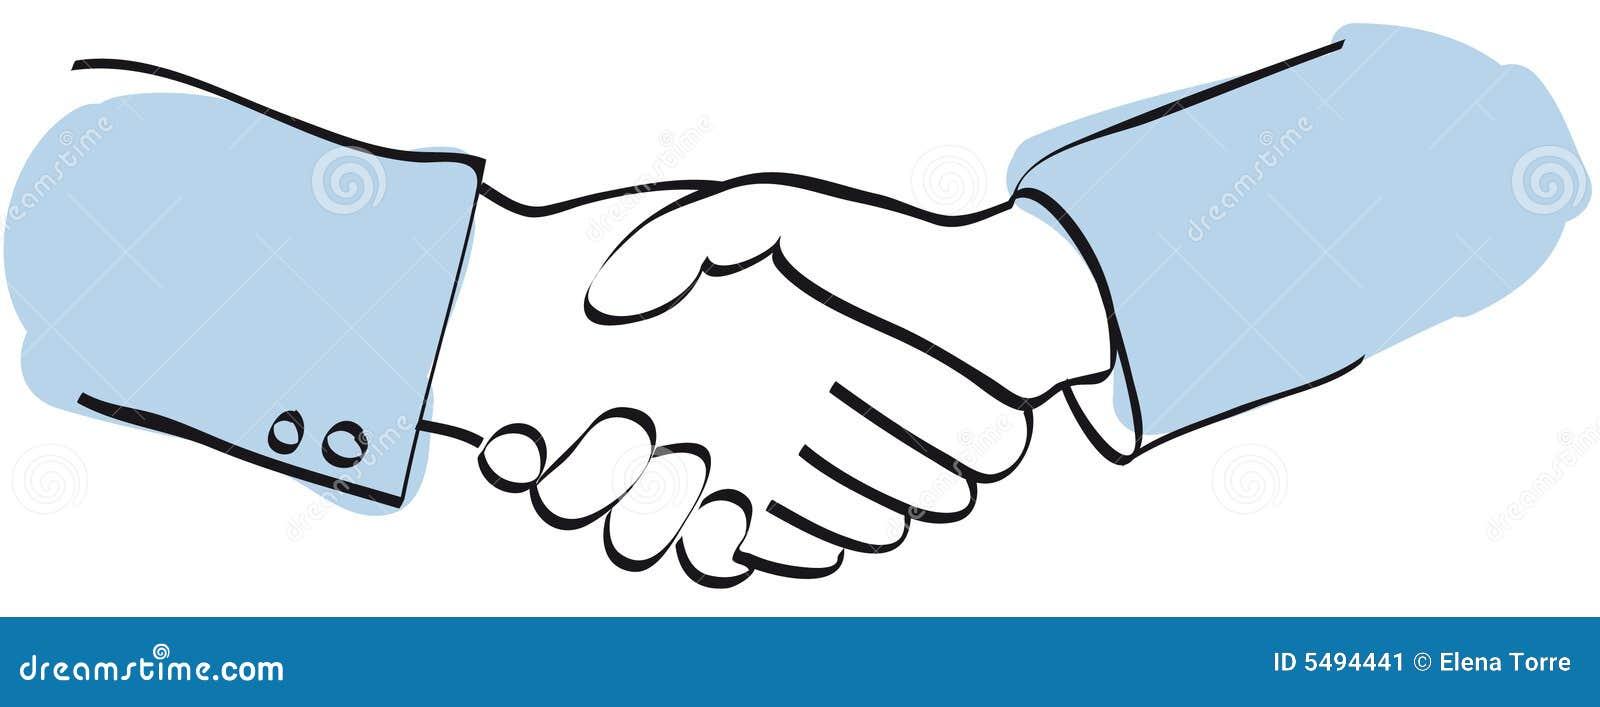 Handshake Vector Stock Image - Image: 5494441